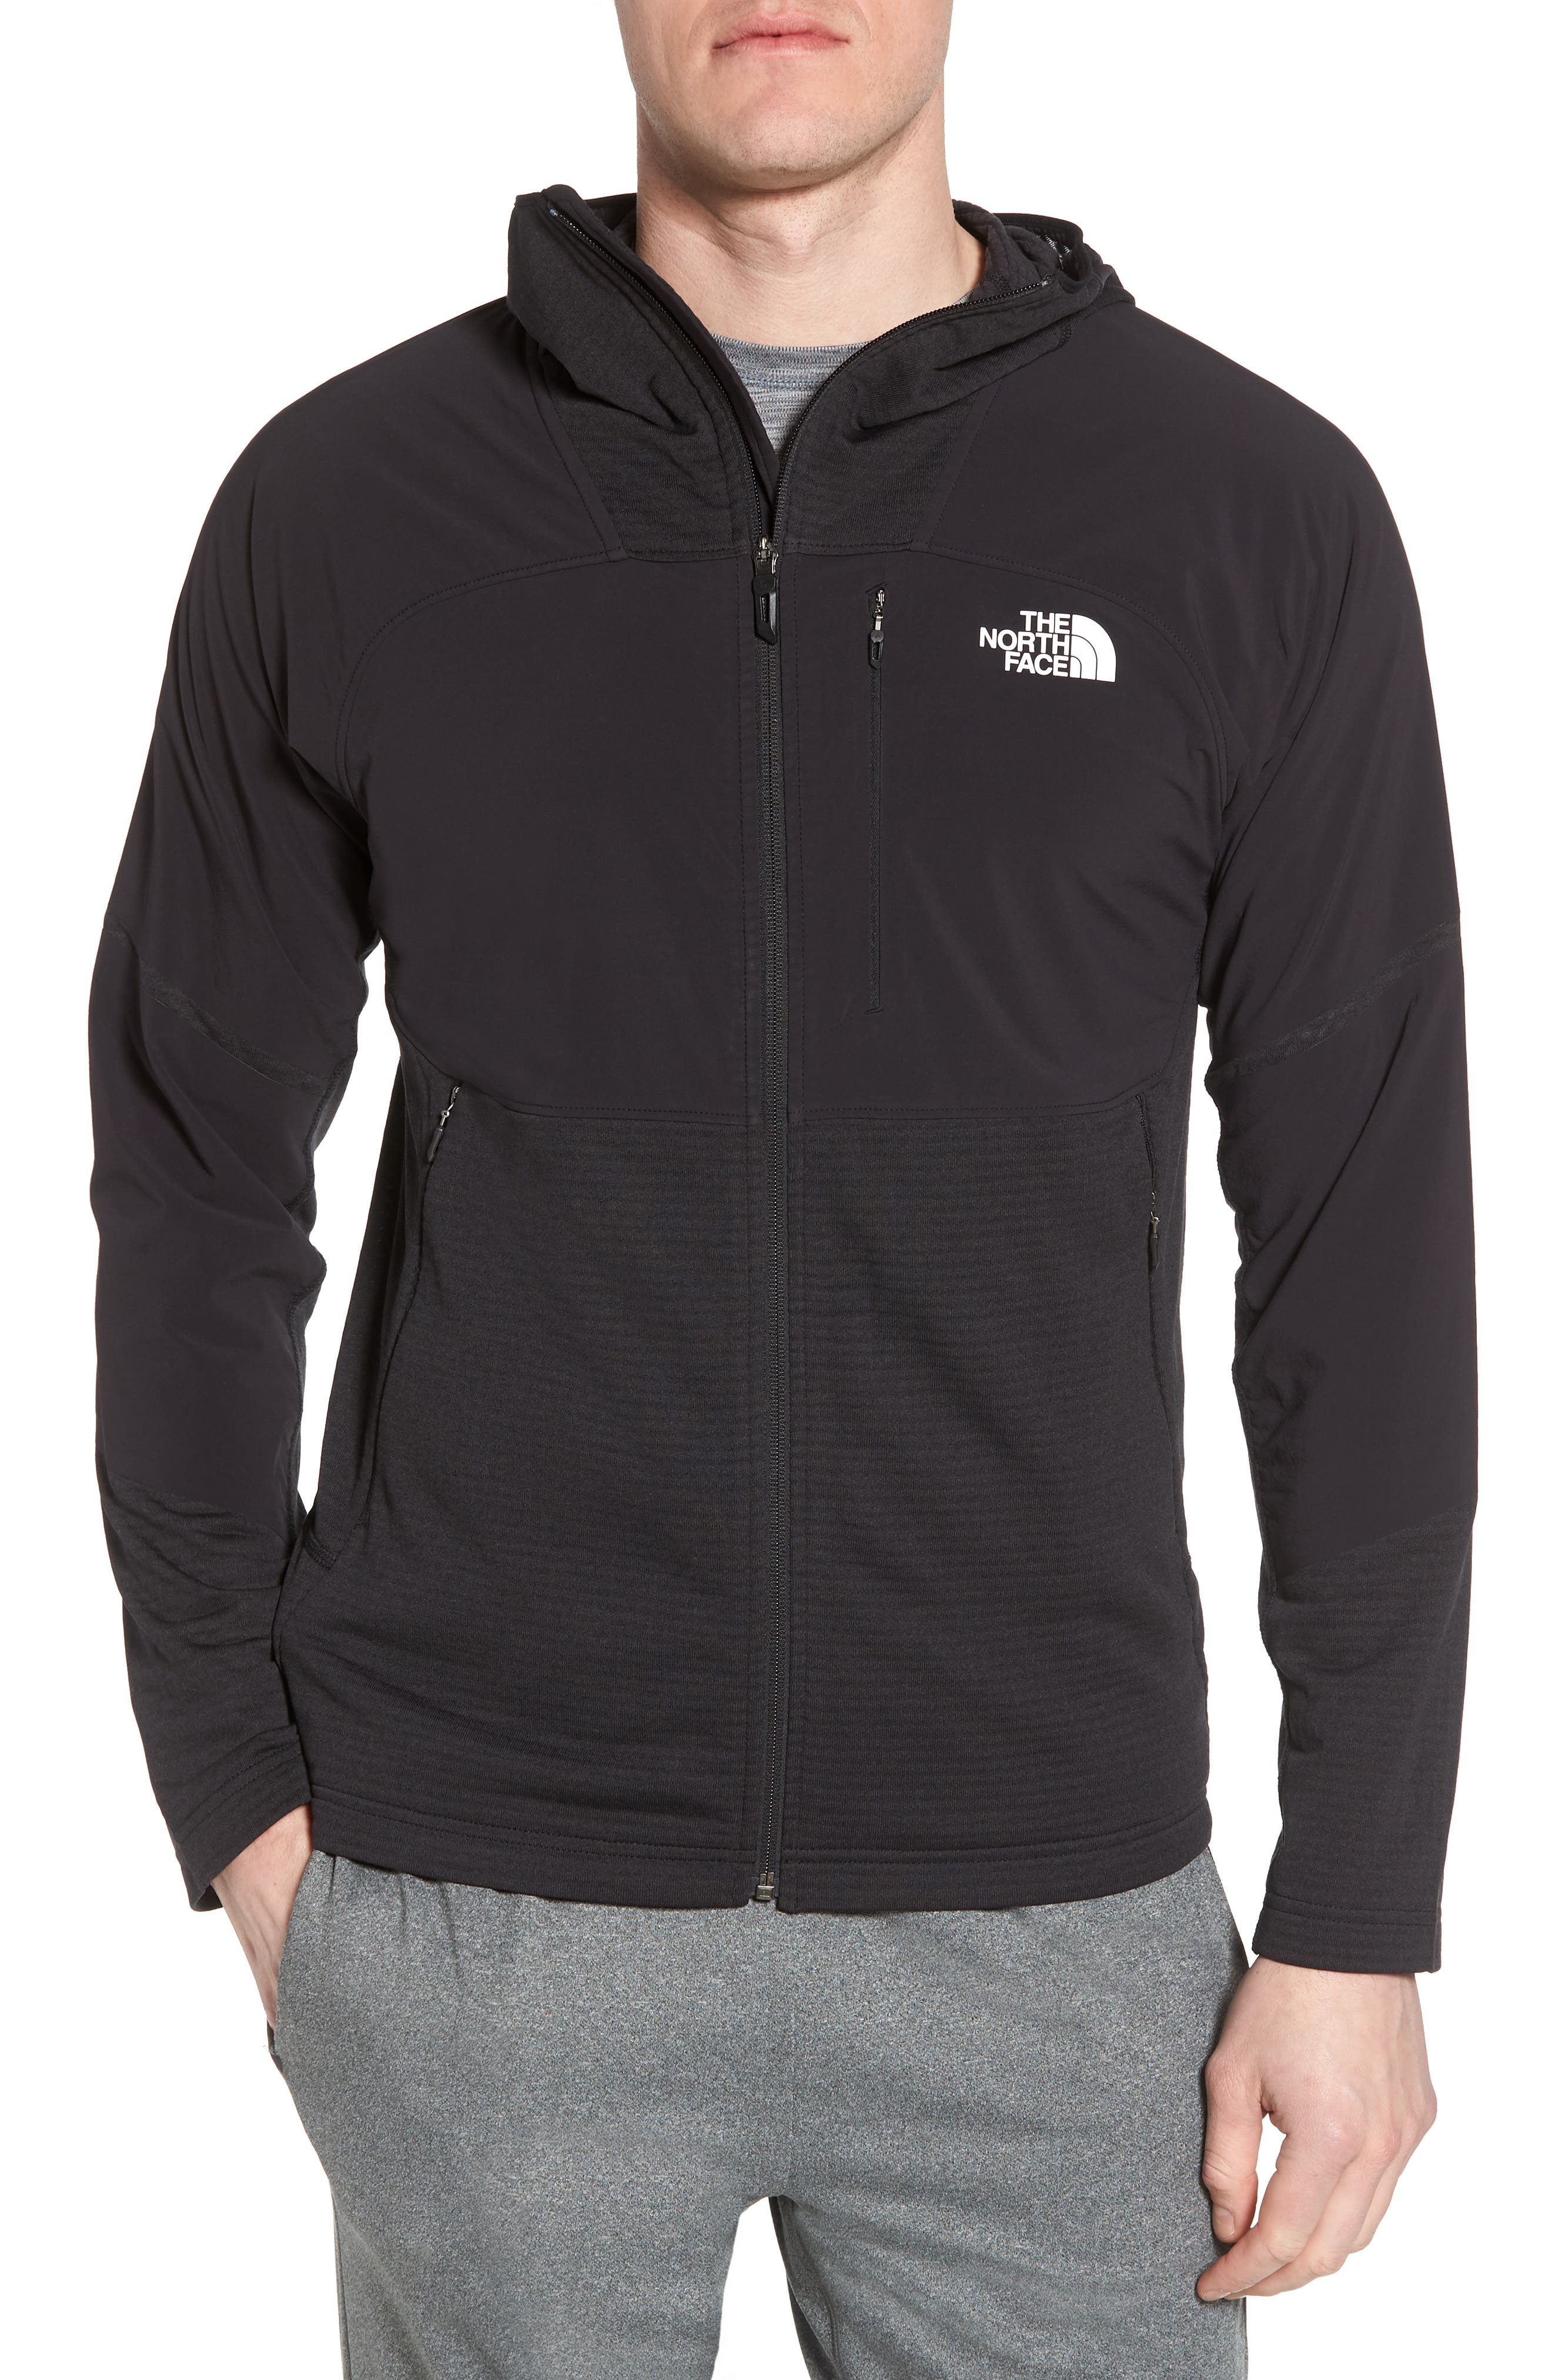 Progressor Power Grid<sup>™</sup> Hooded Fleece Jacket,                             Main thumbnail 1, color,                             Black/ Black